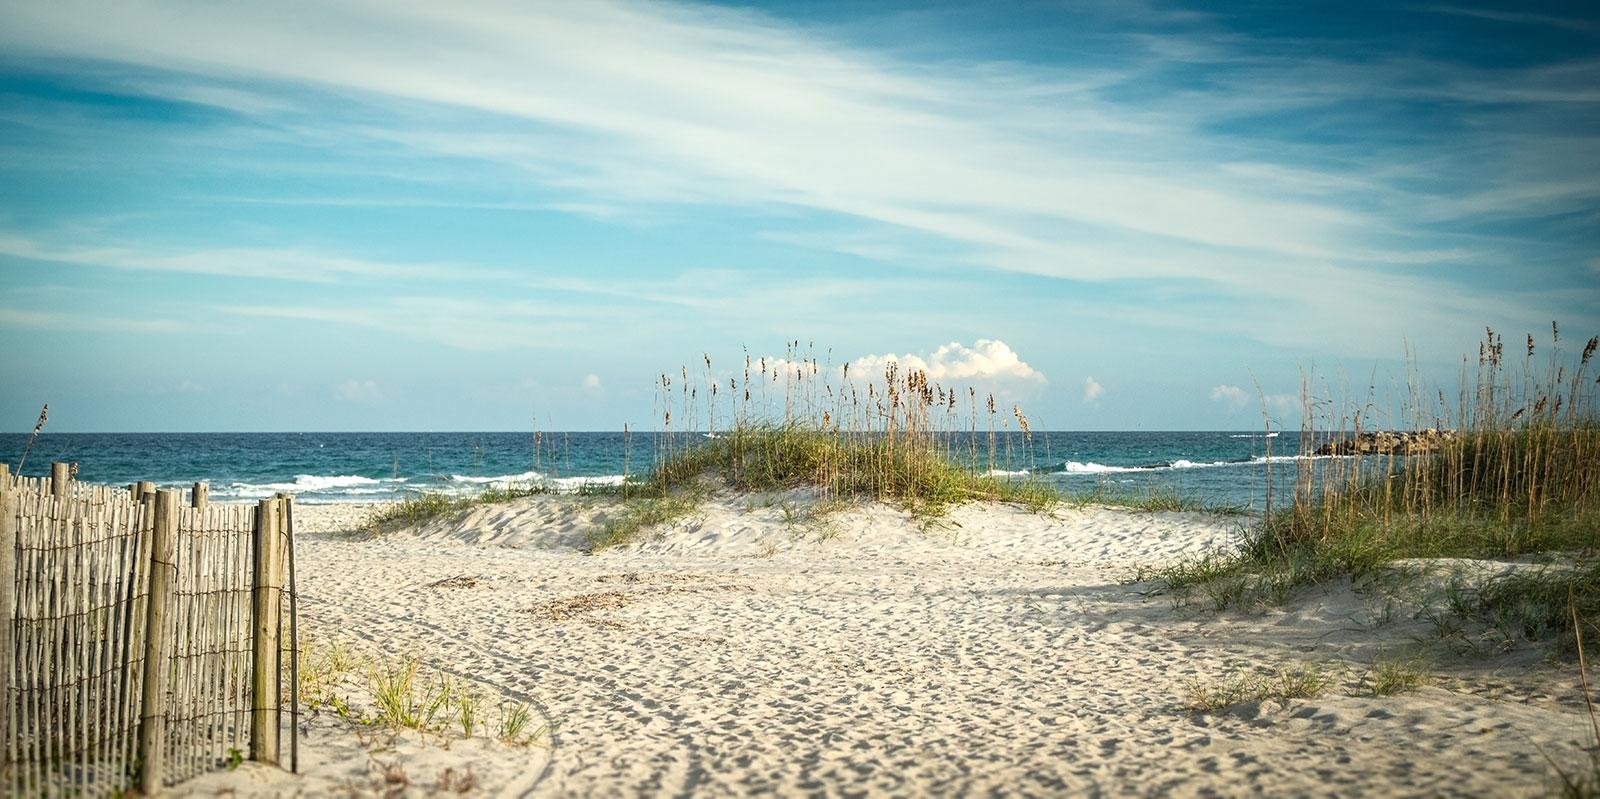 North Carolina coast with dunes